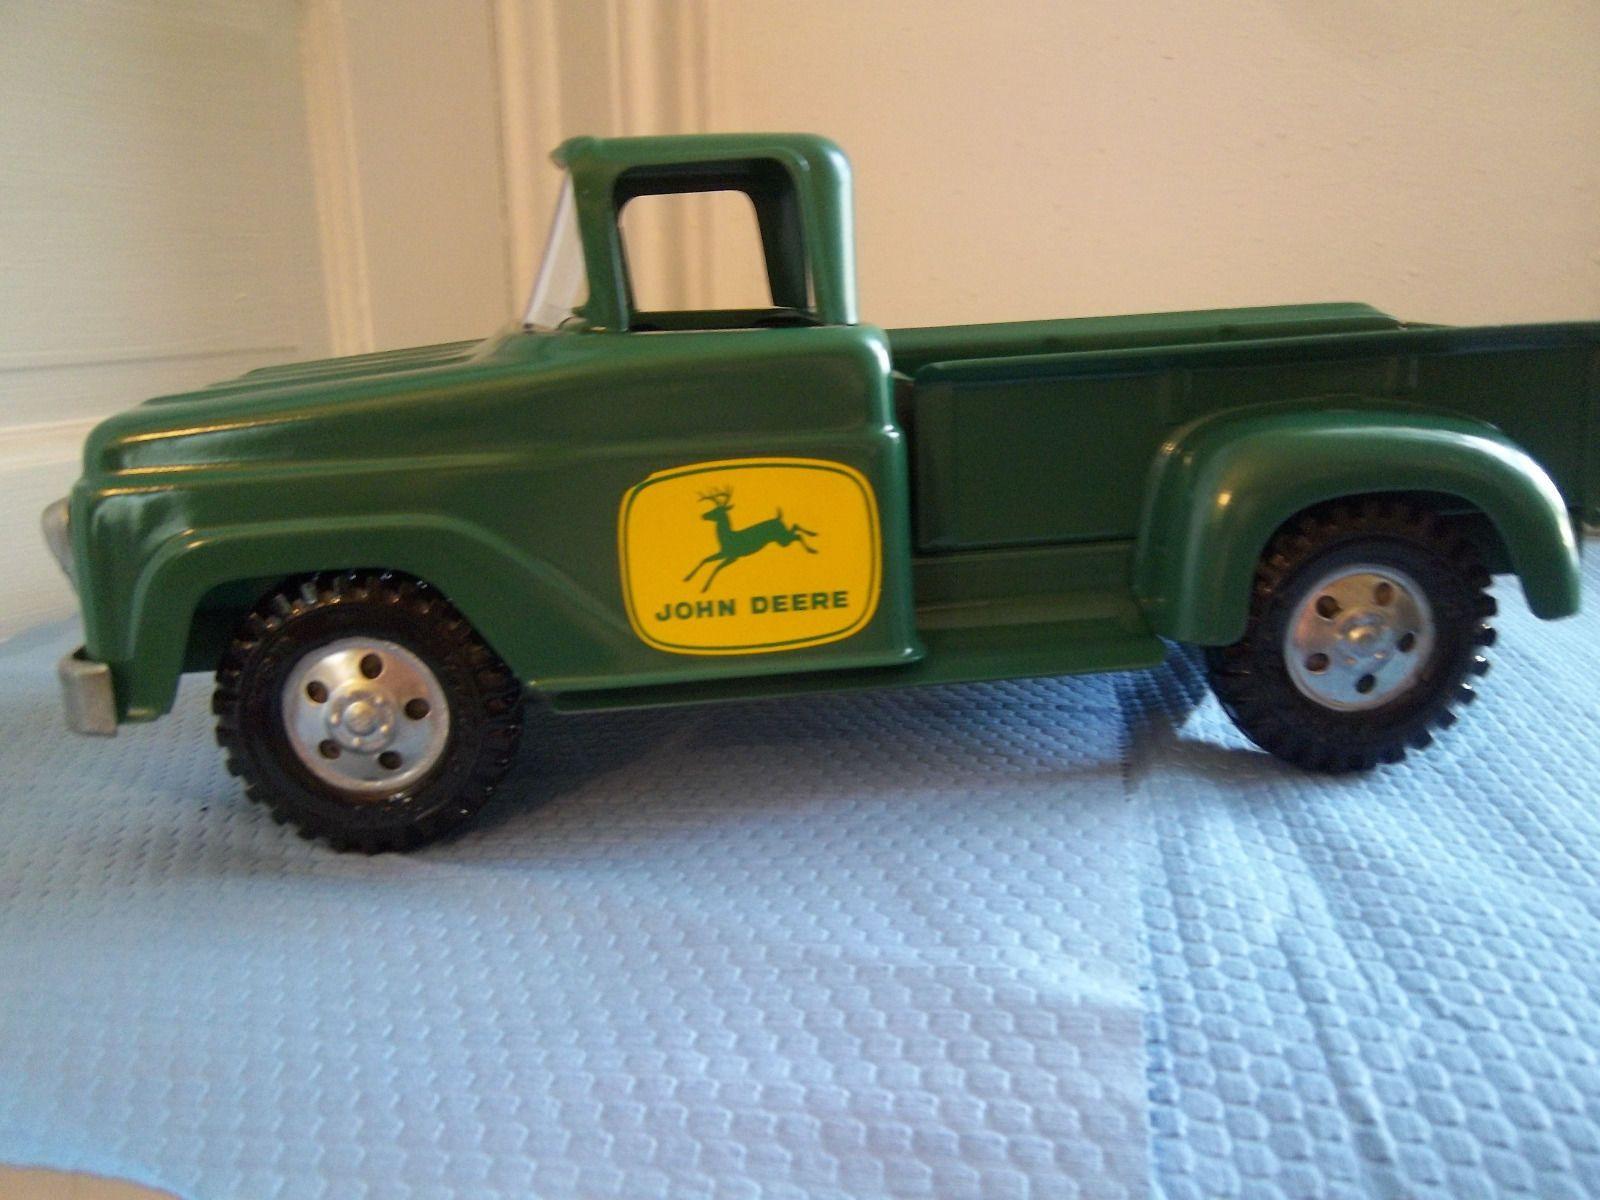 1958 custom john deere tonka pickup truck in toys hobbies diecast vehicles cars